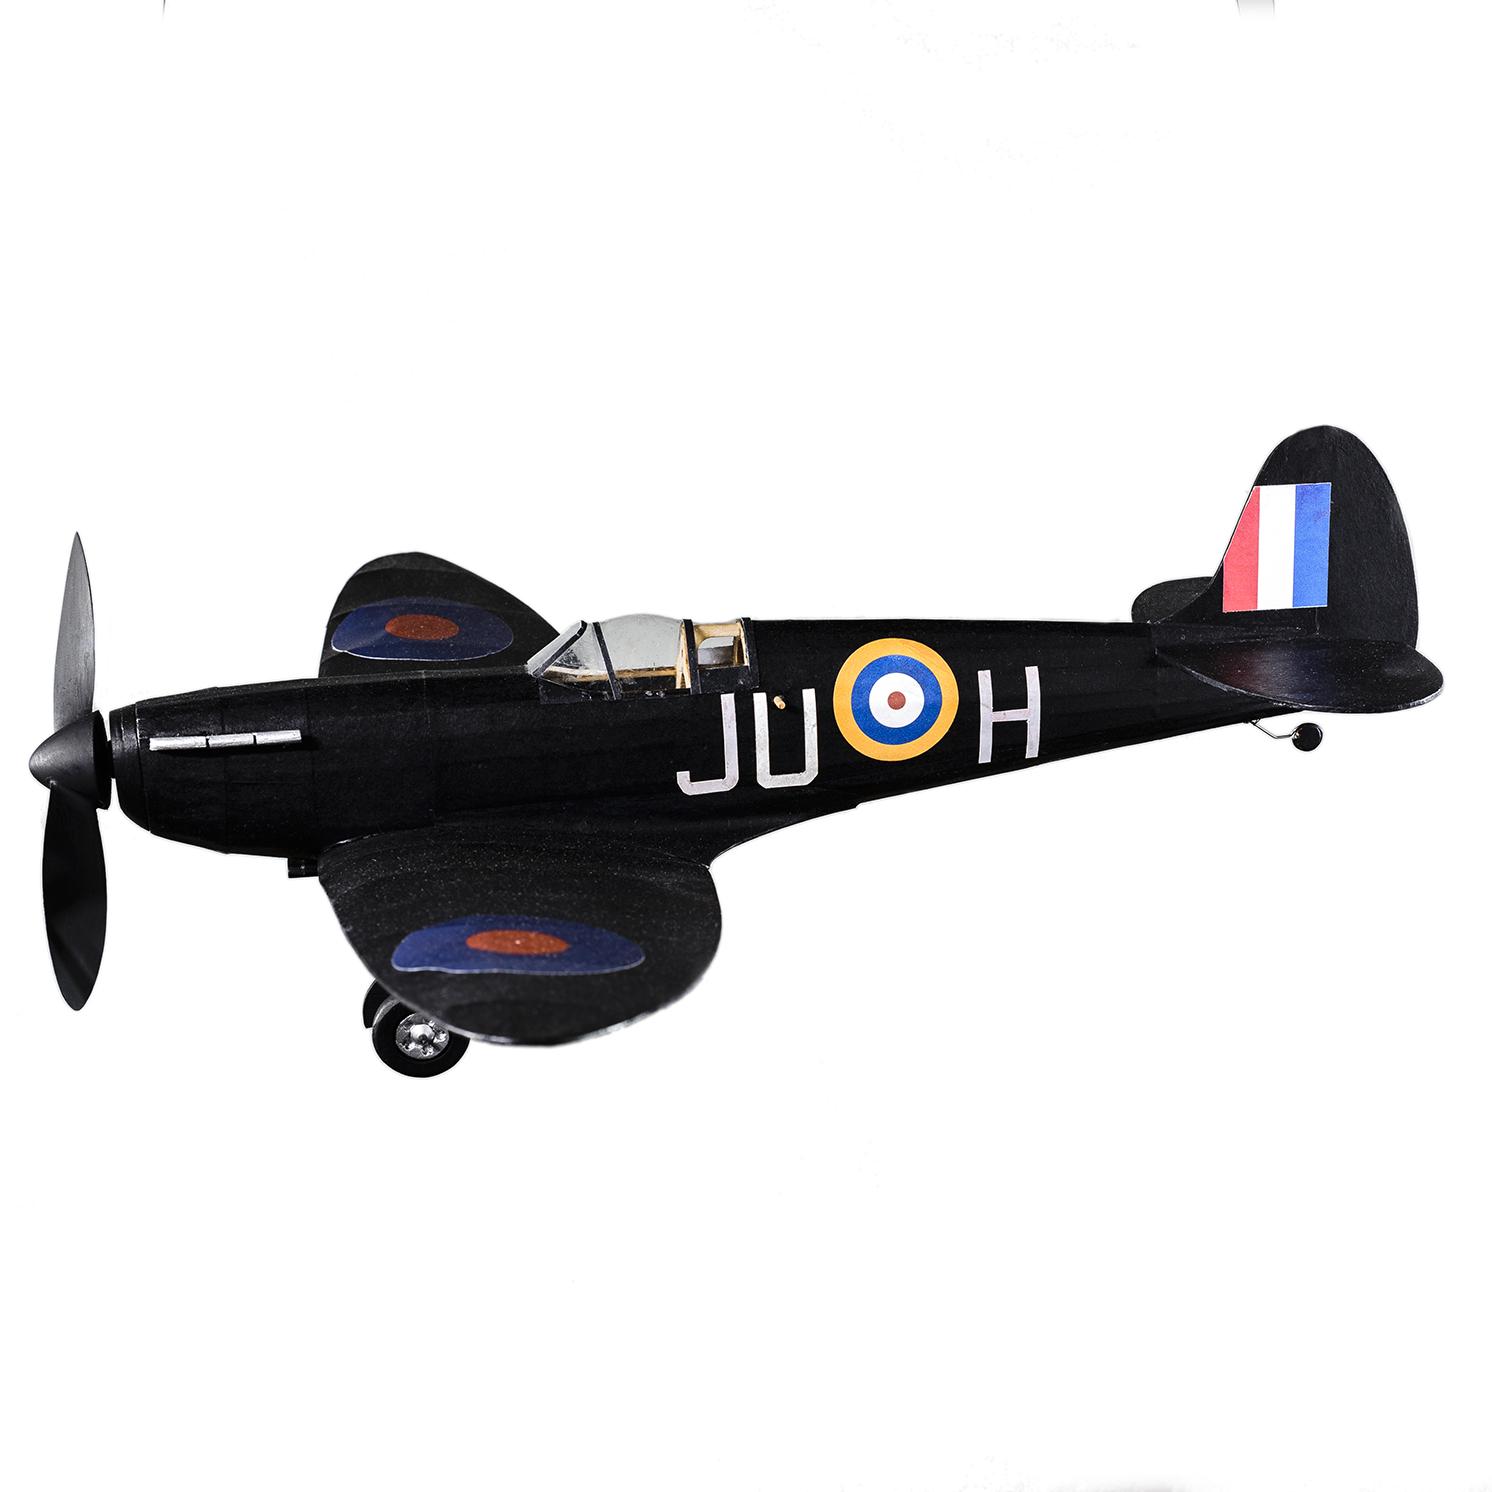 The Vintage Model Company – Supermarine Spitfire Night Fighter Balsa Wood Kit